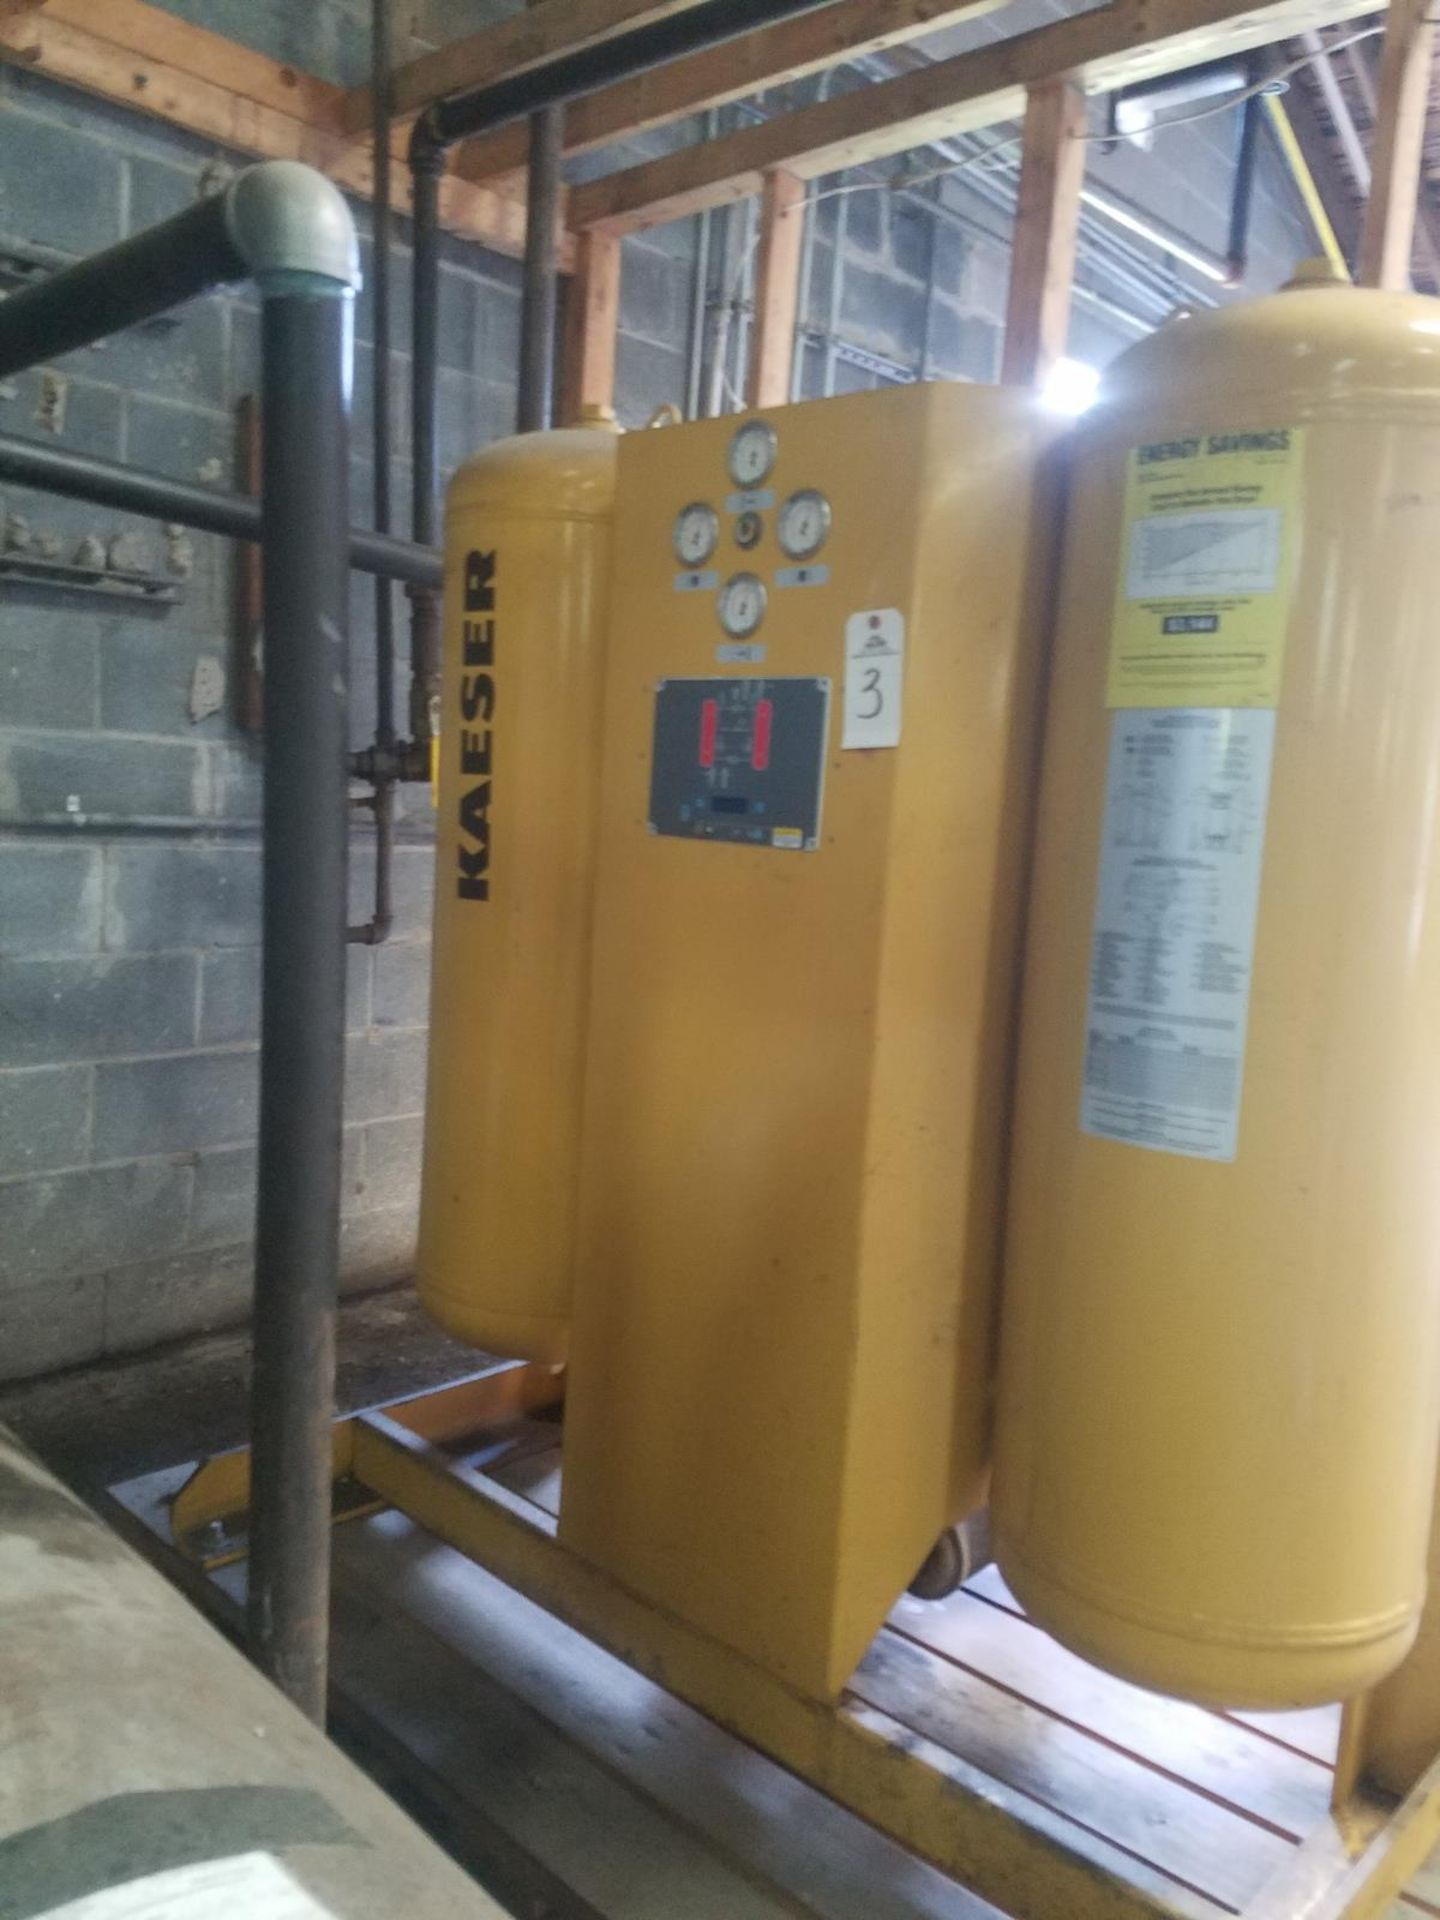 Kaeser Compressed Air Dryer, M# KADPS-370, 370 SCFM at 100 PSIG, 120F Max Operat | Rig Fee: $250